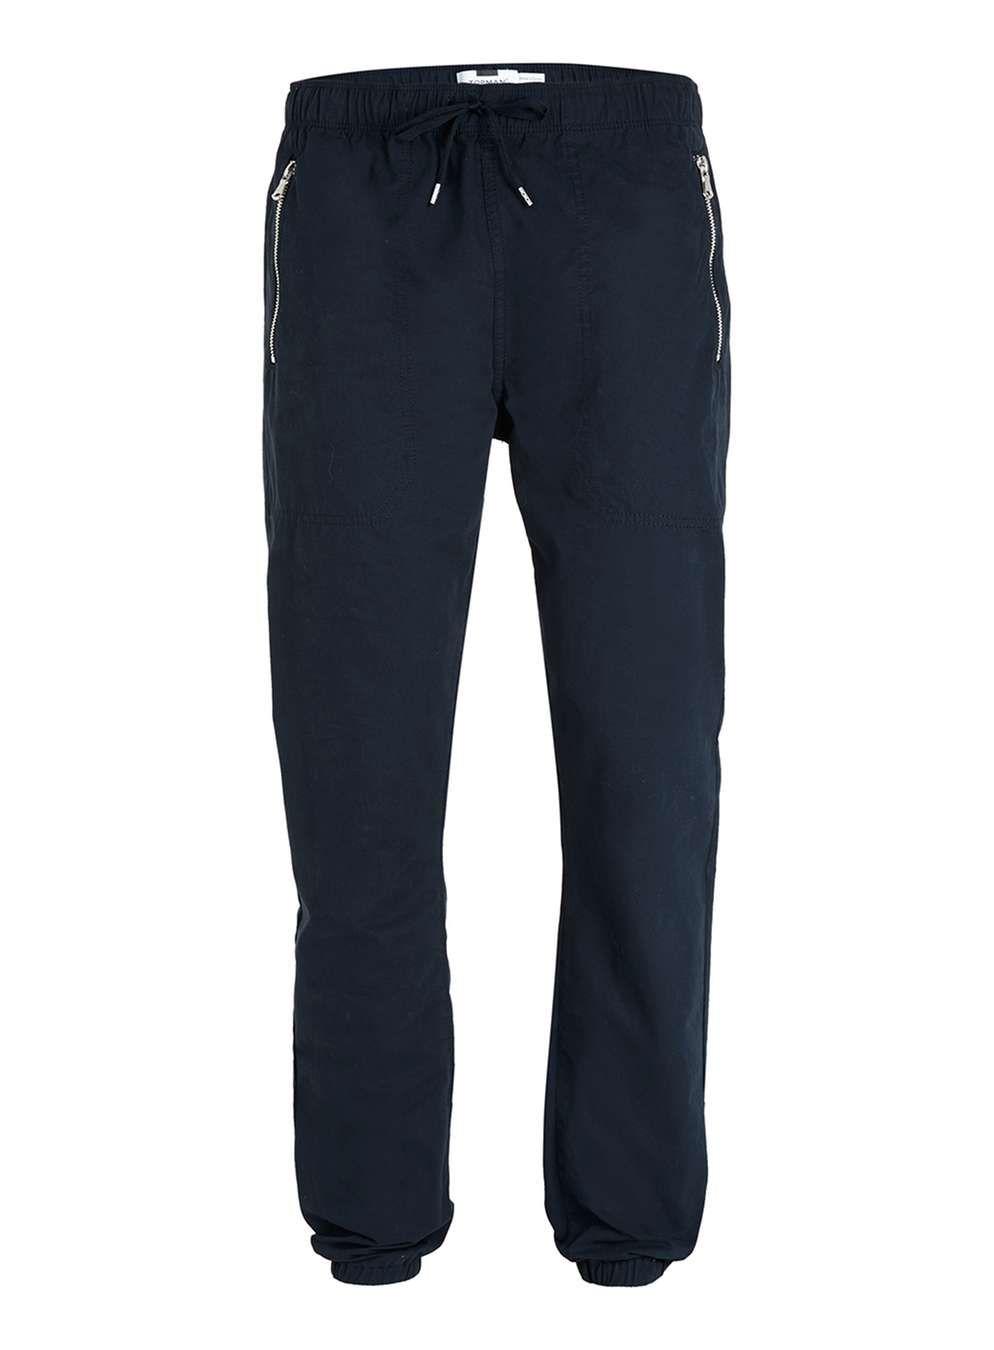 Navy Woven Skinny Joggers - Topman